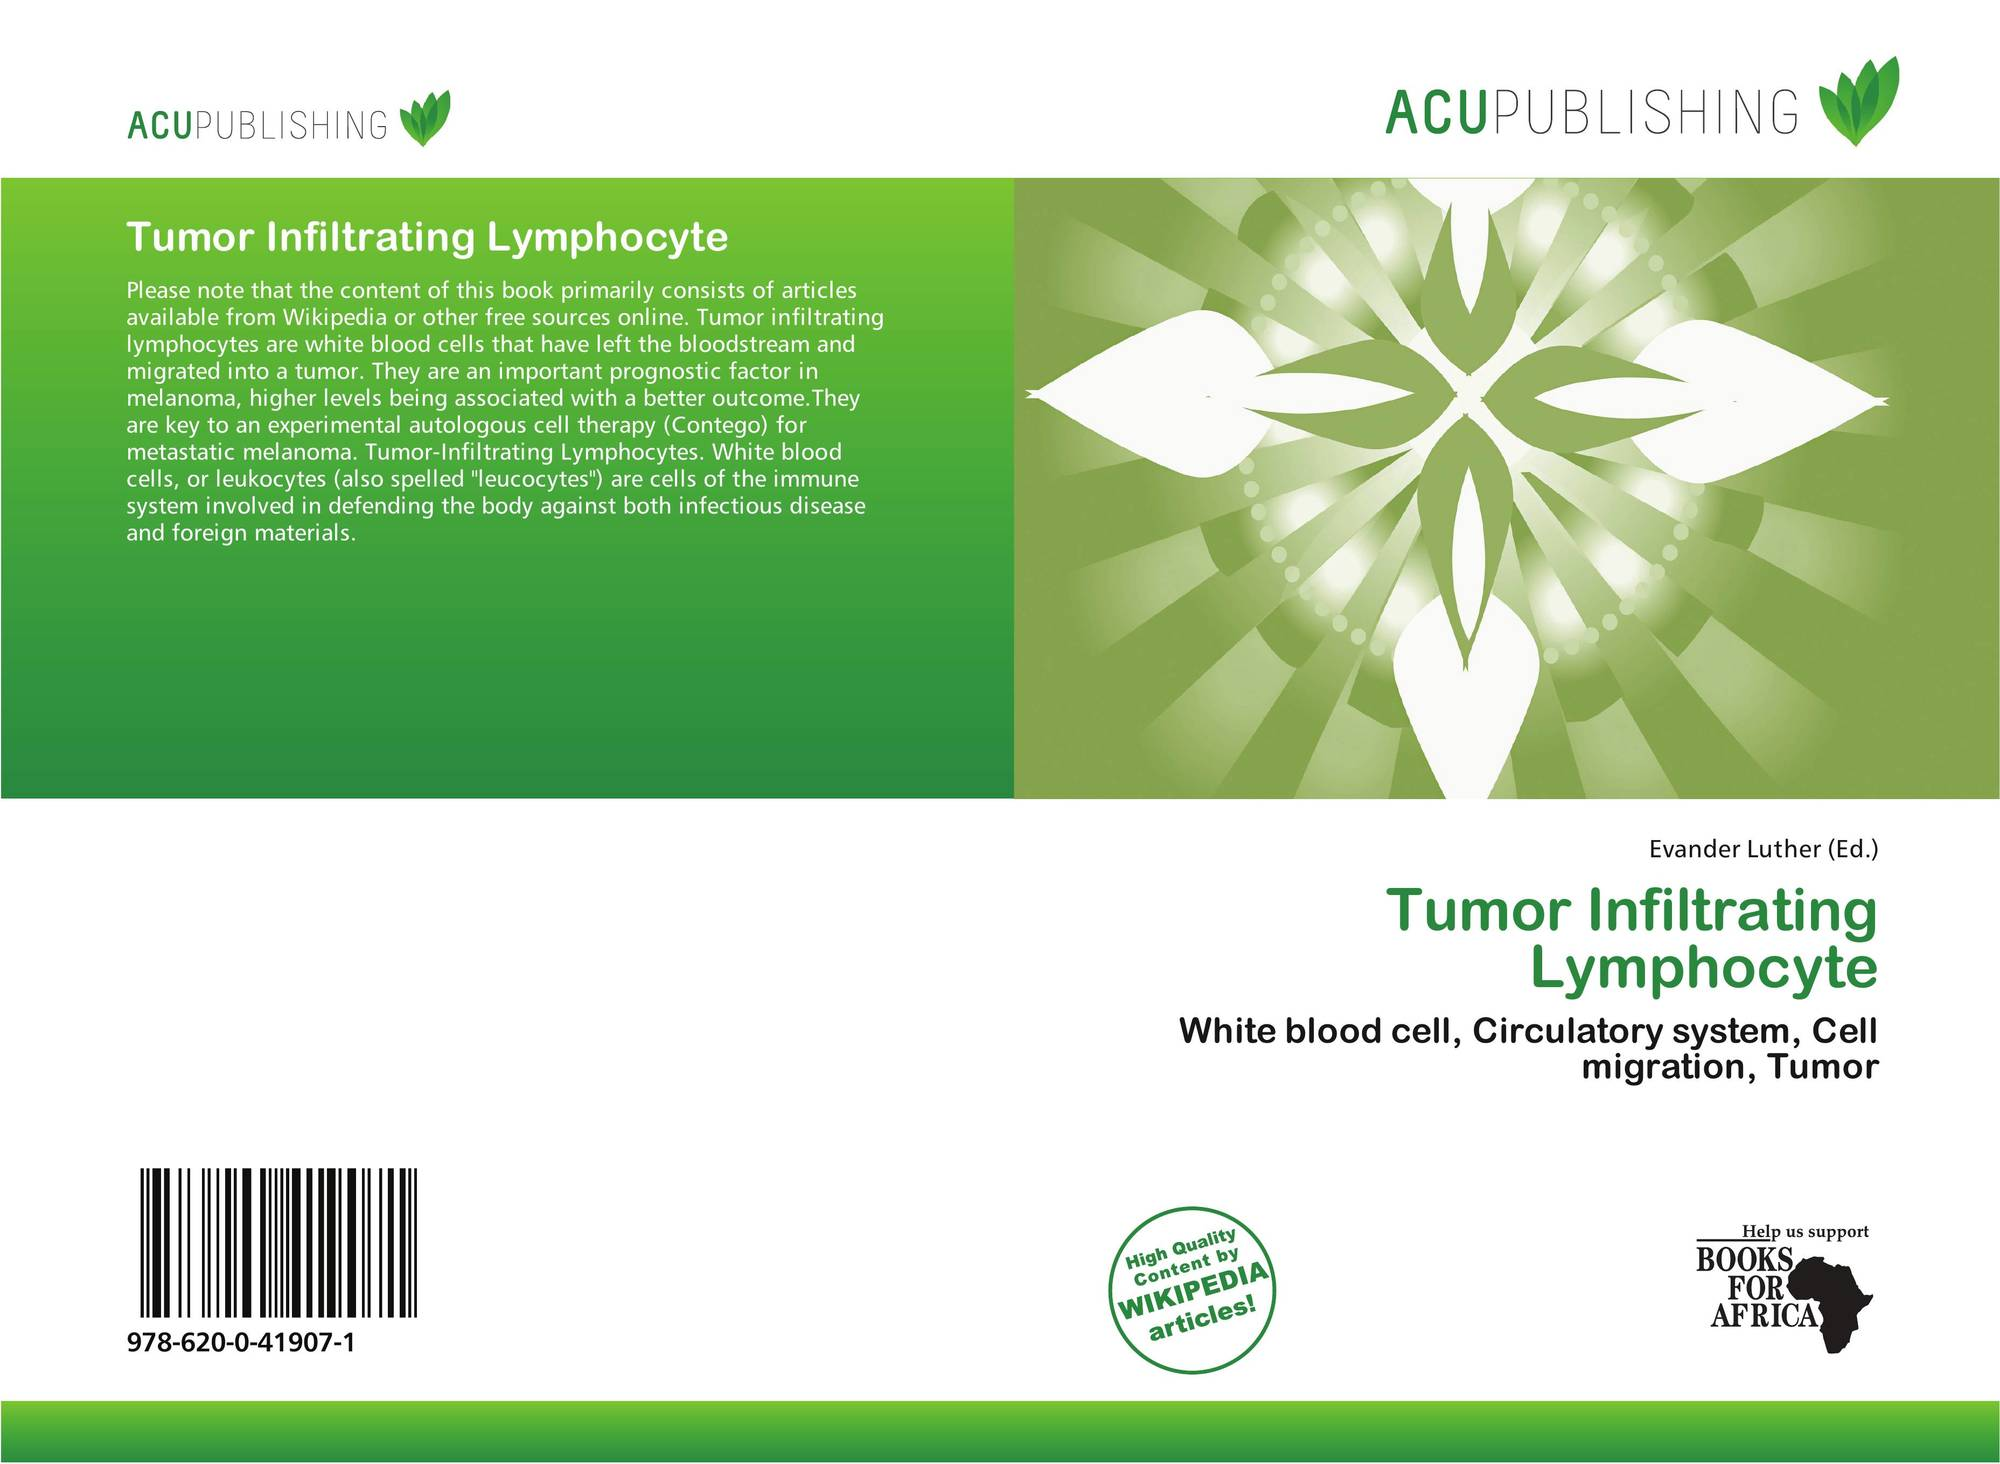 Tumor Infiltrating Lymphocyte, 440 440 40 4409407 40, 4404044094078 ...